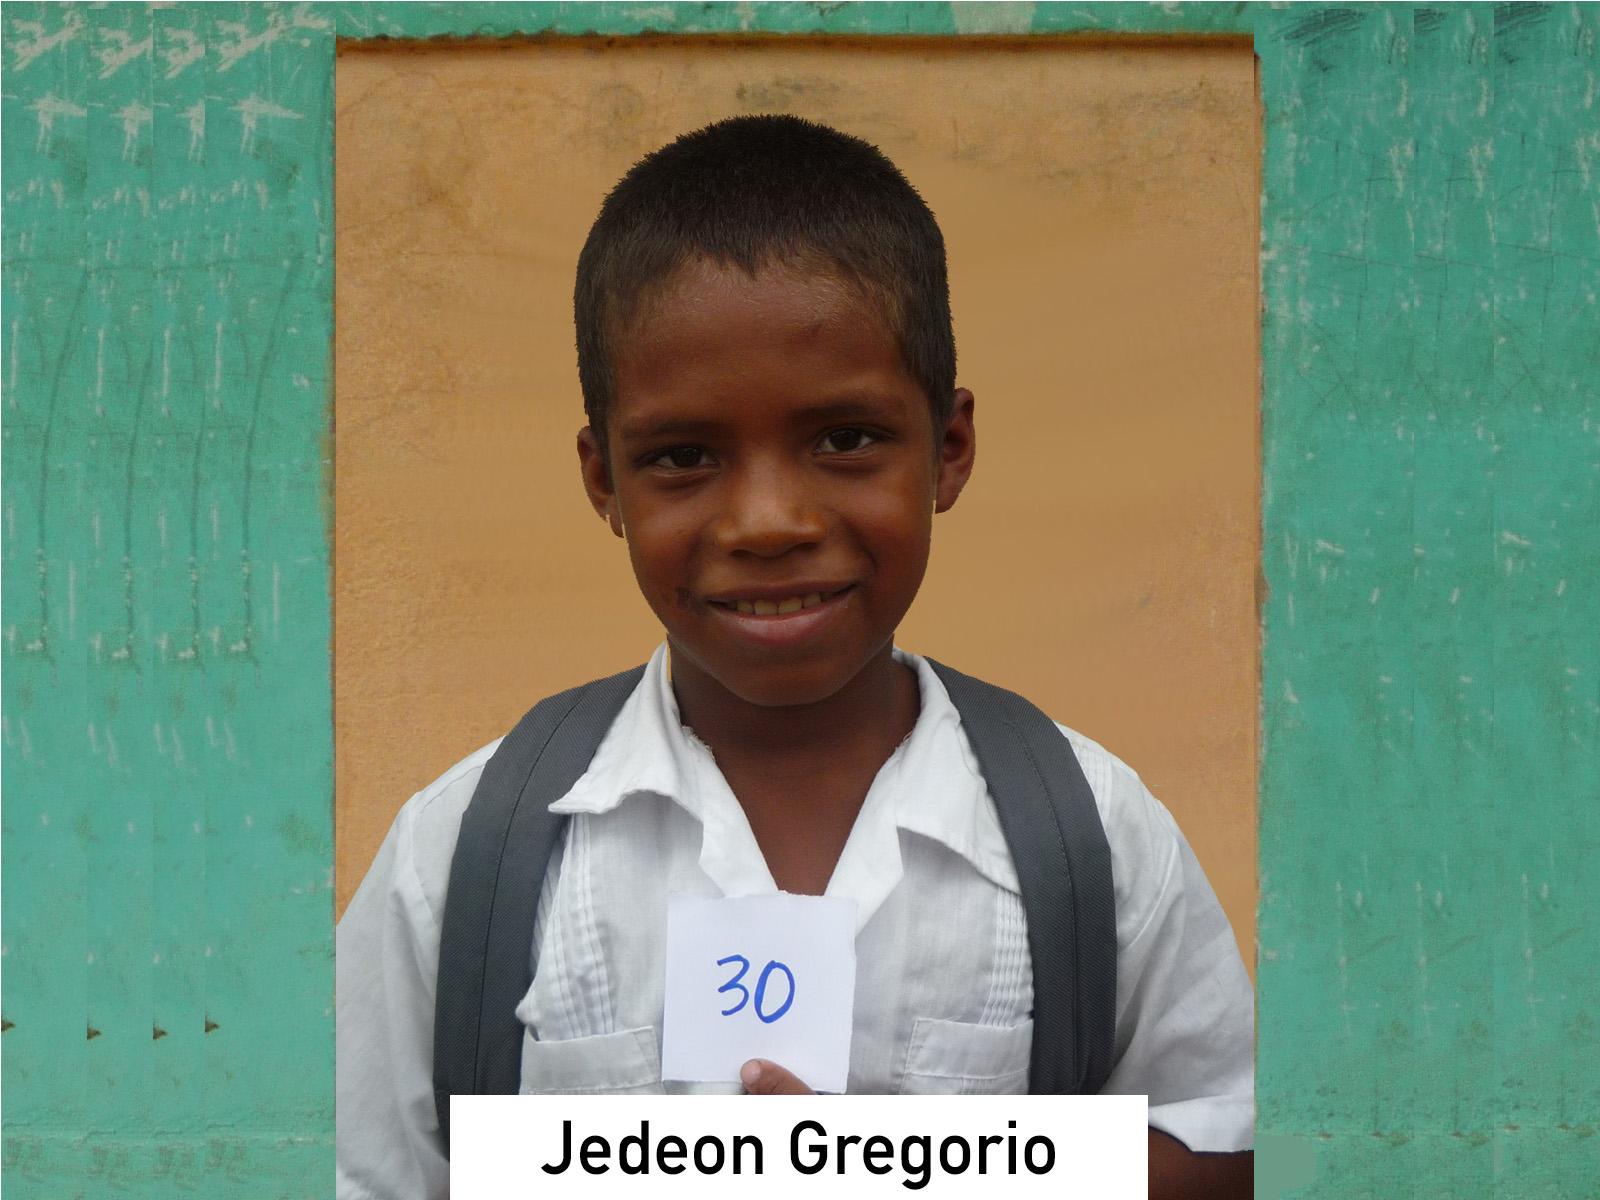 030 - Jedeon Gregorio.jpg